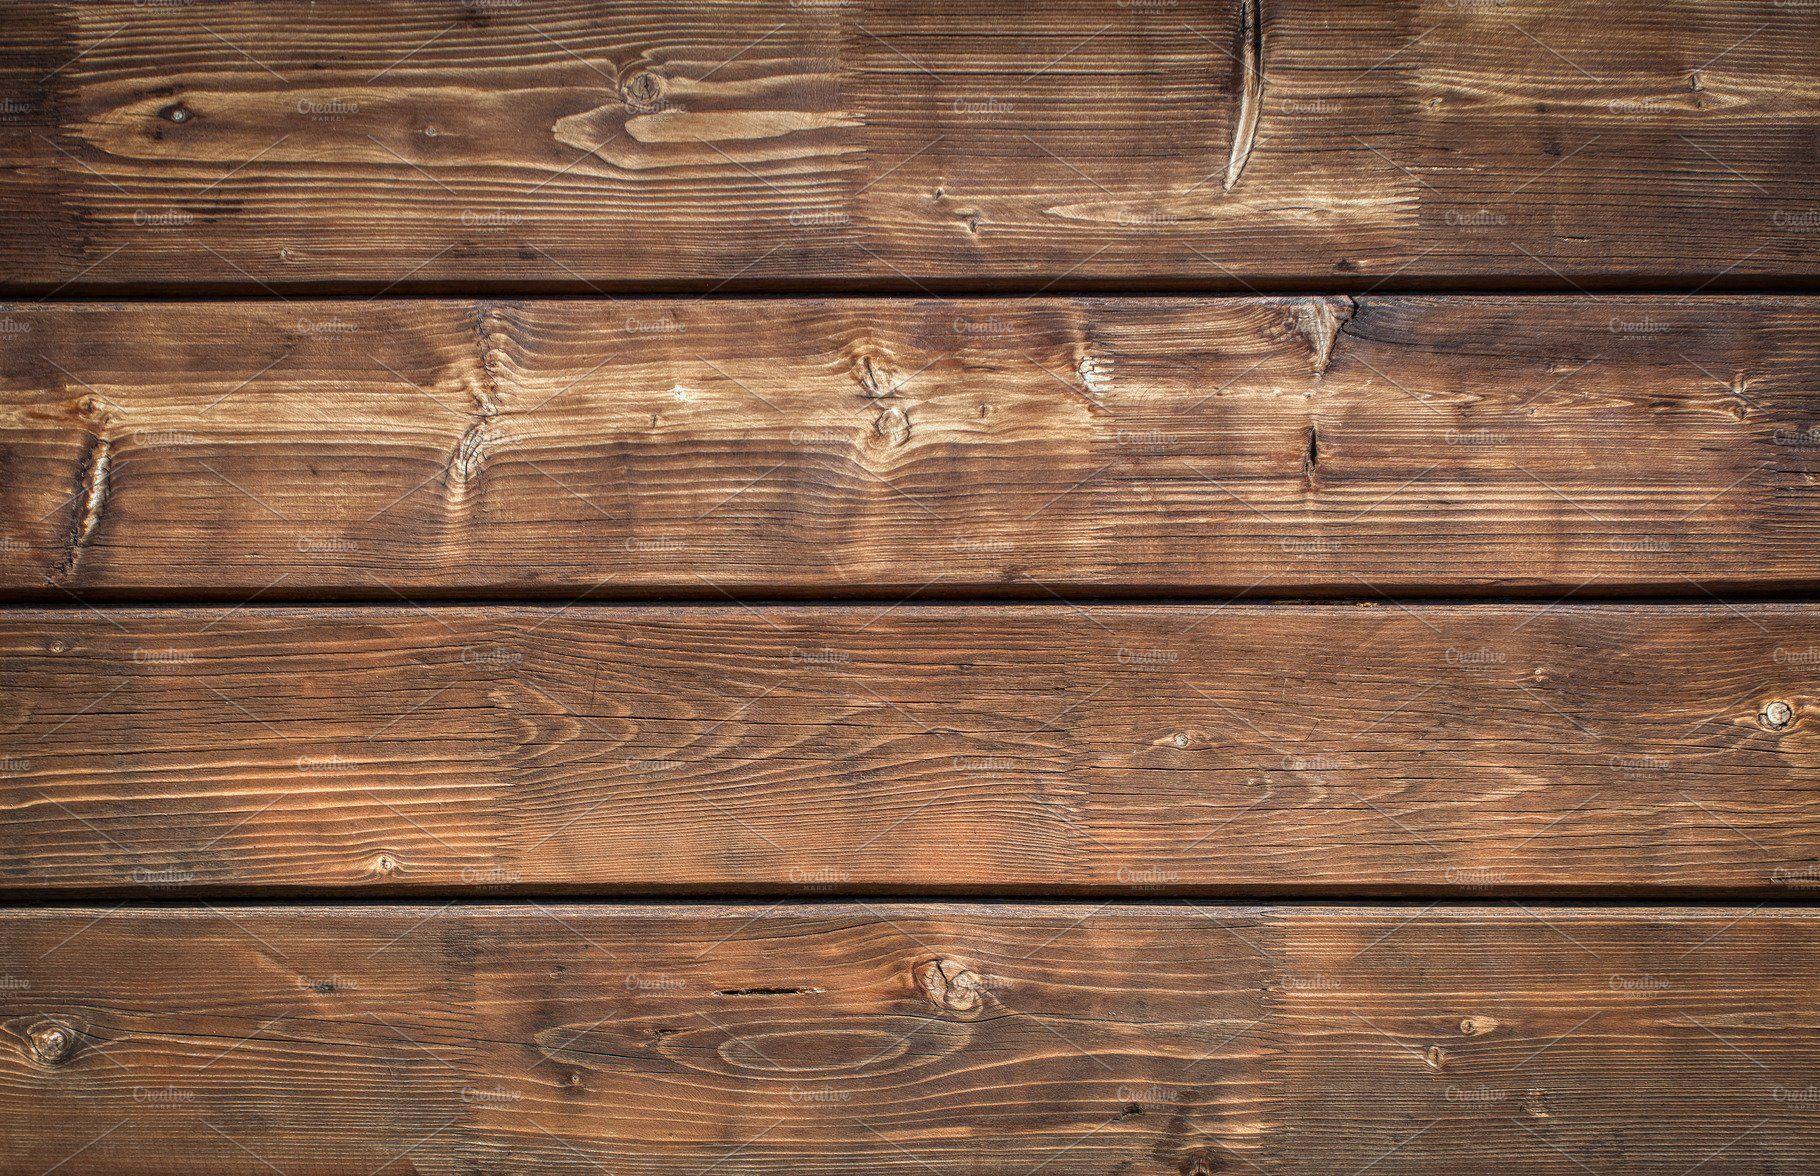 Vintage Wooden Background In 2020 Wooden Background Vintage Wood Wood Texture Background